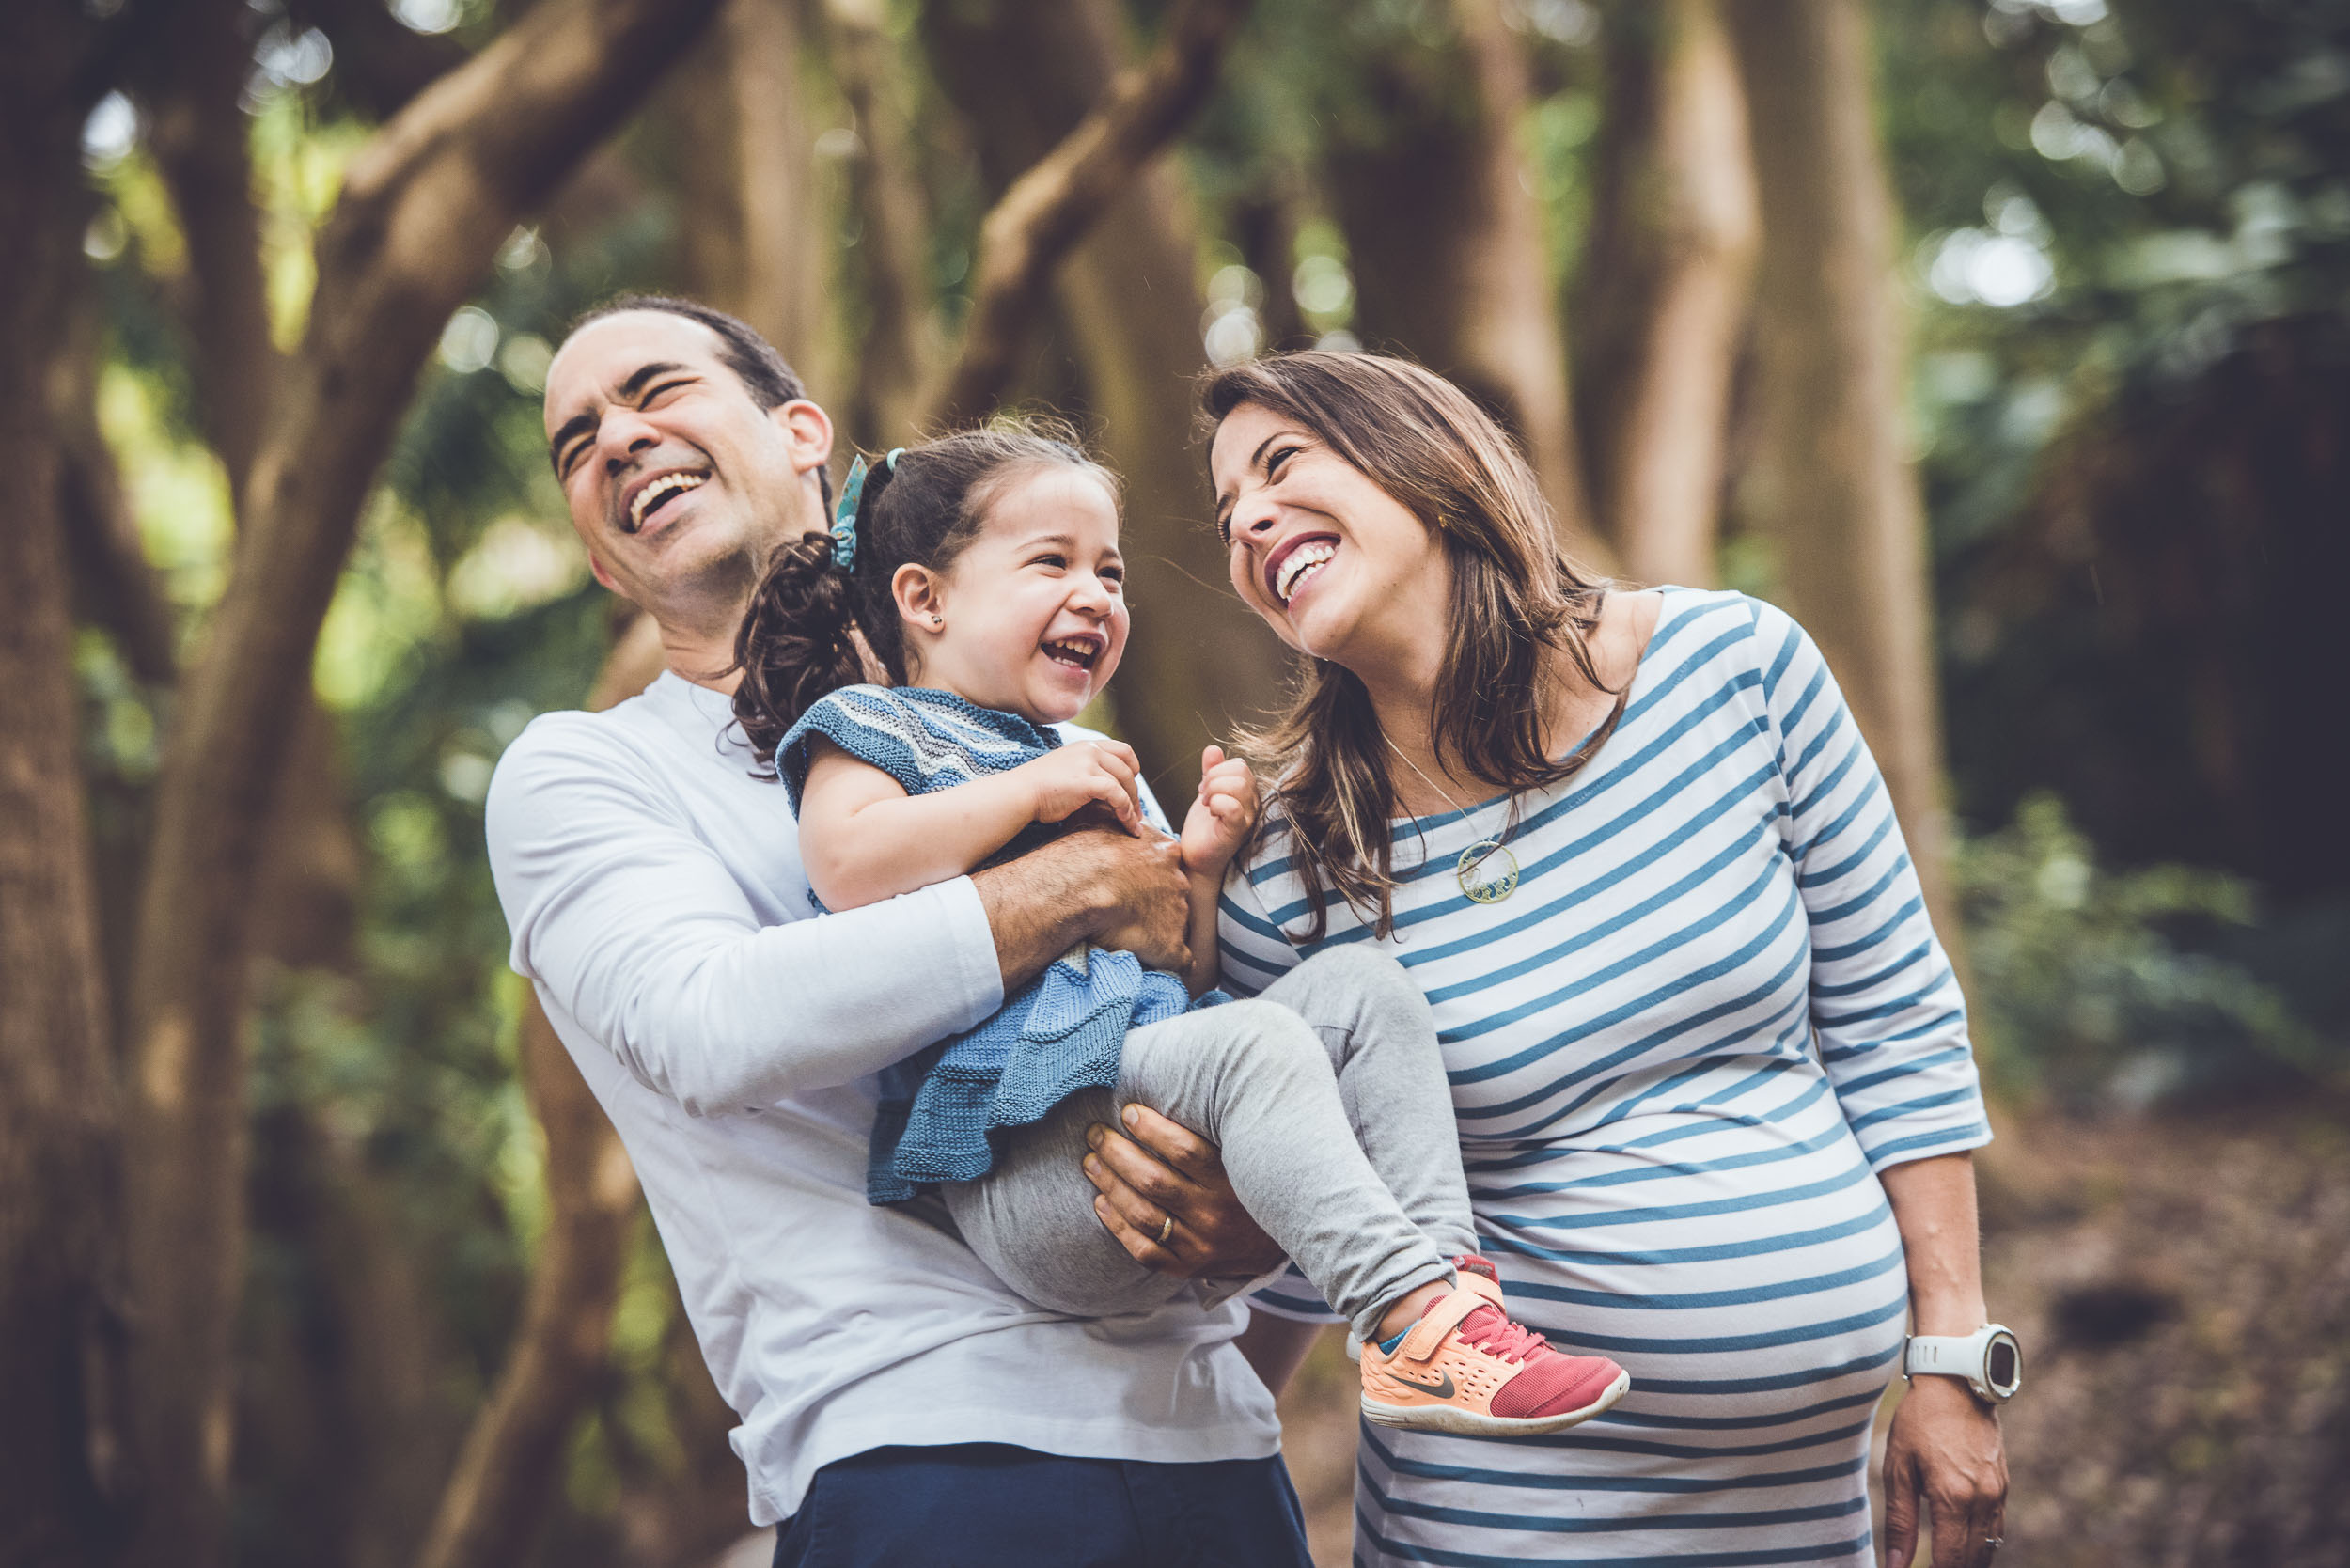 Family - Lifestyle - Photo credit Nicola Bailey.jpg